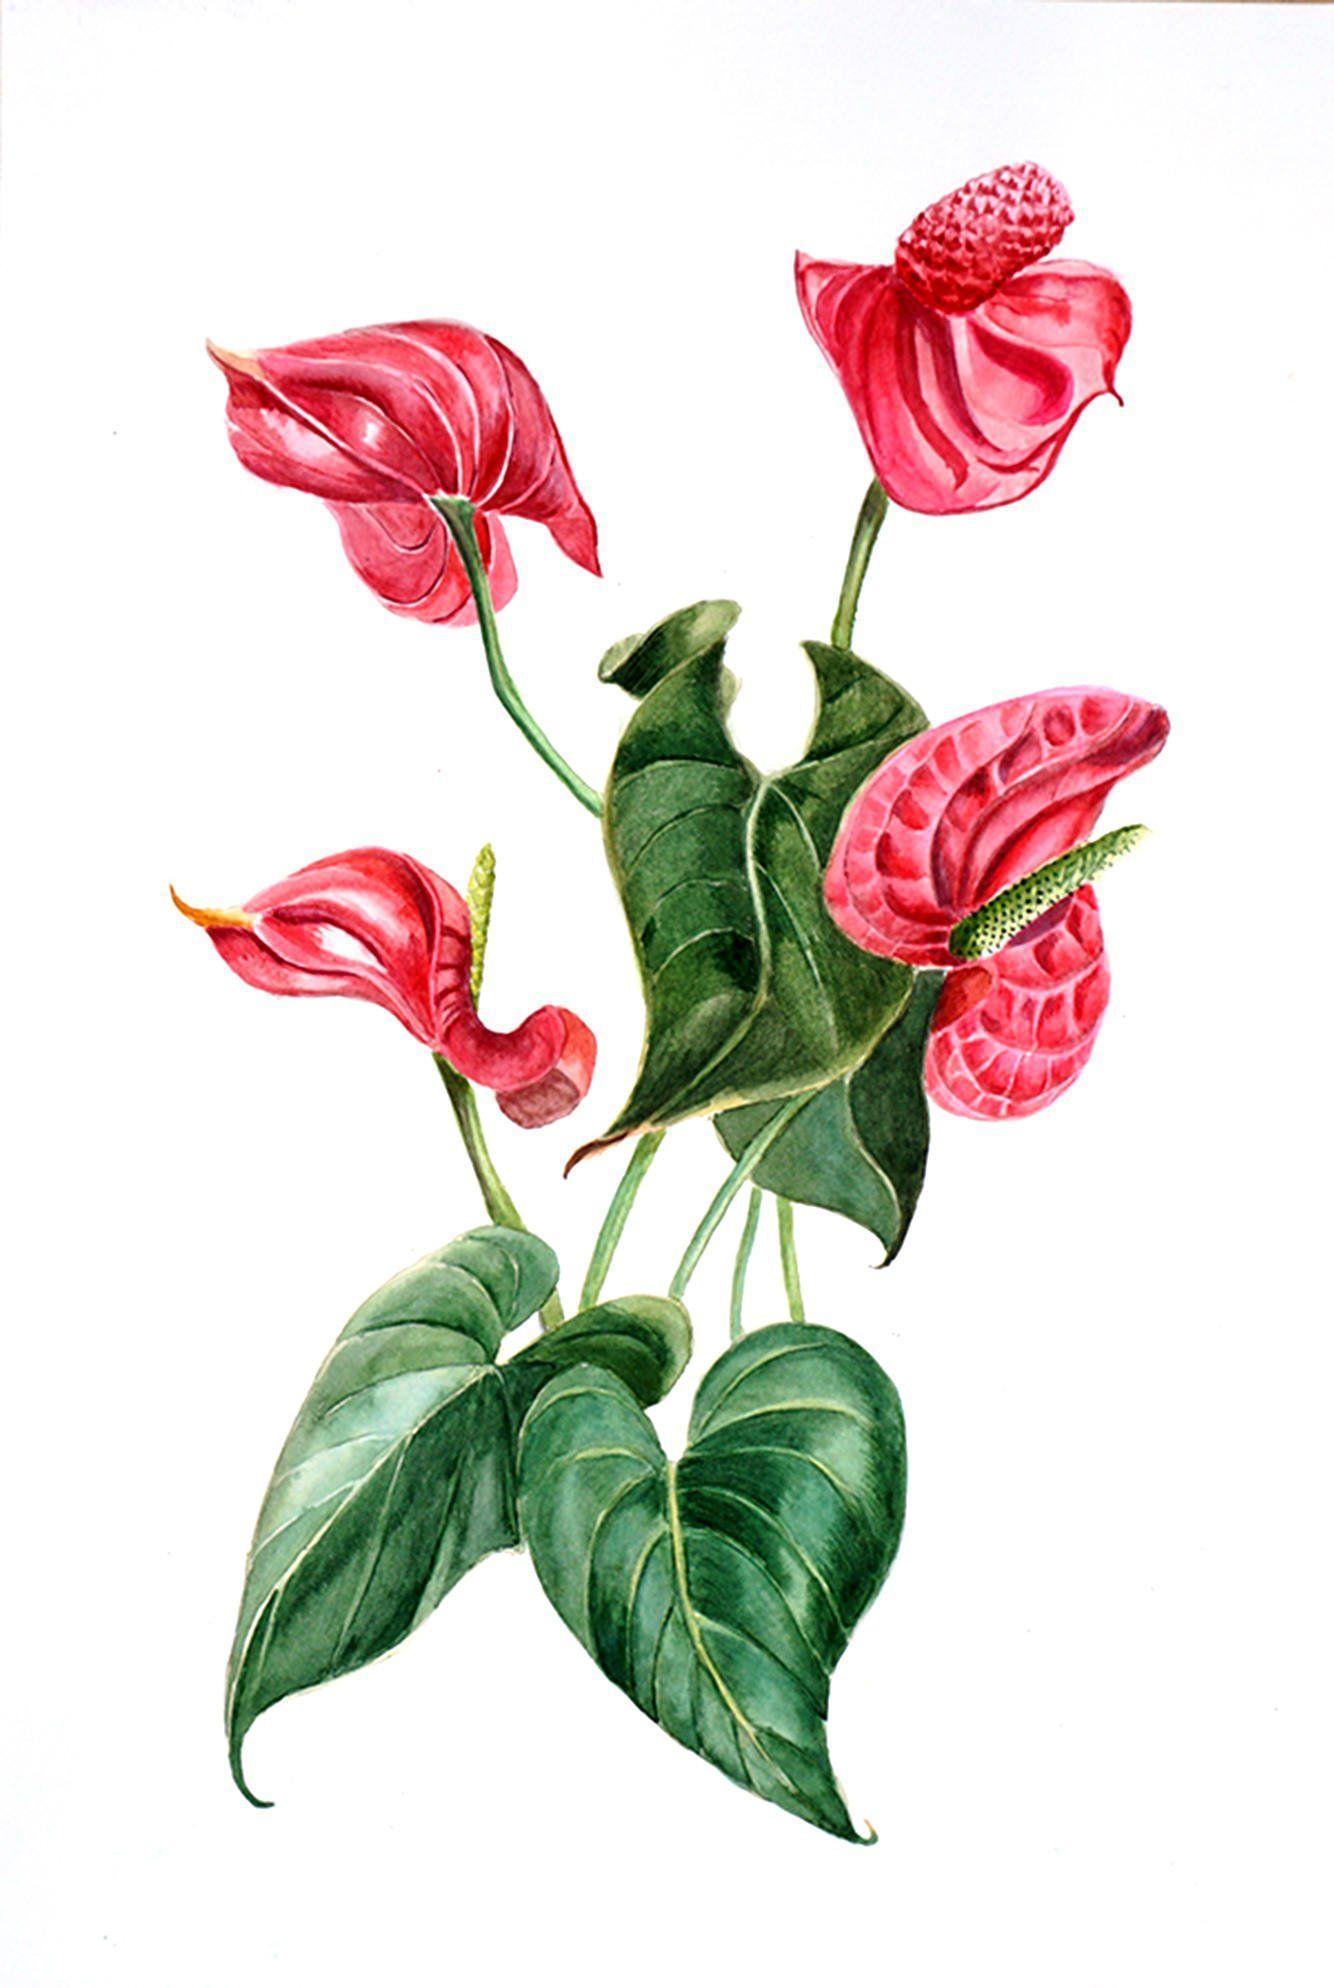 Red Flower Painting Original Watercolor Anthurium Floral Etsy Flower Painting Original Flower Painting Botanical Wall Art